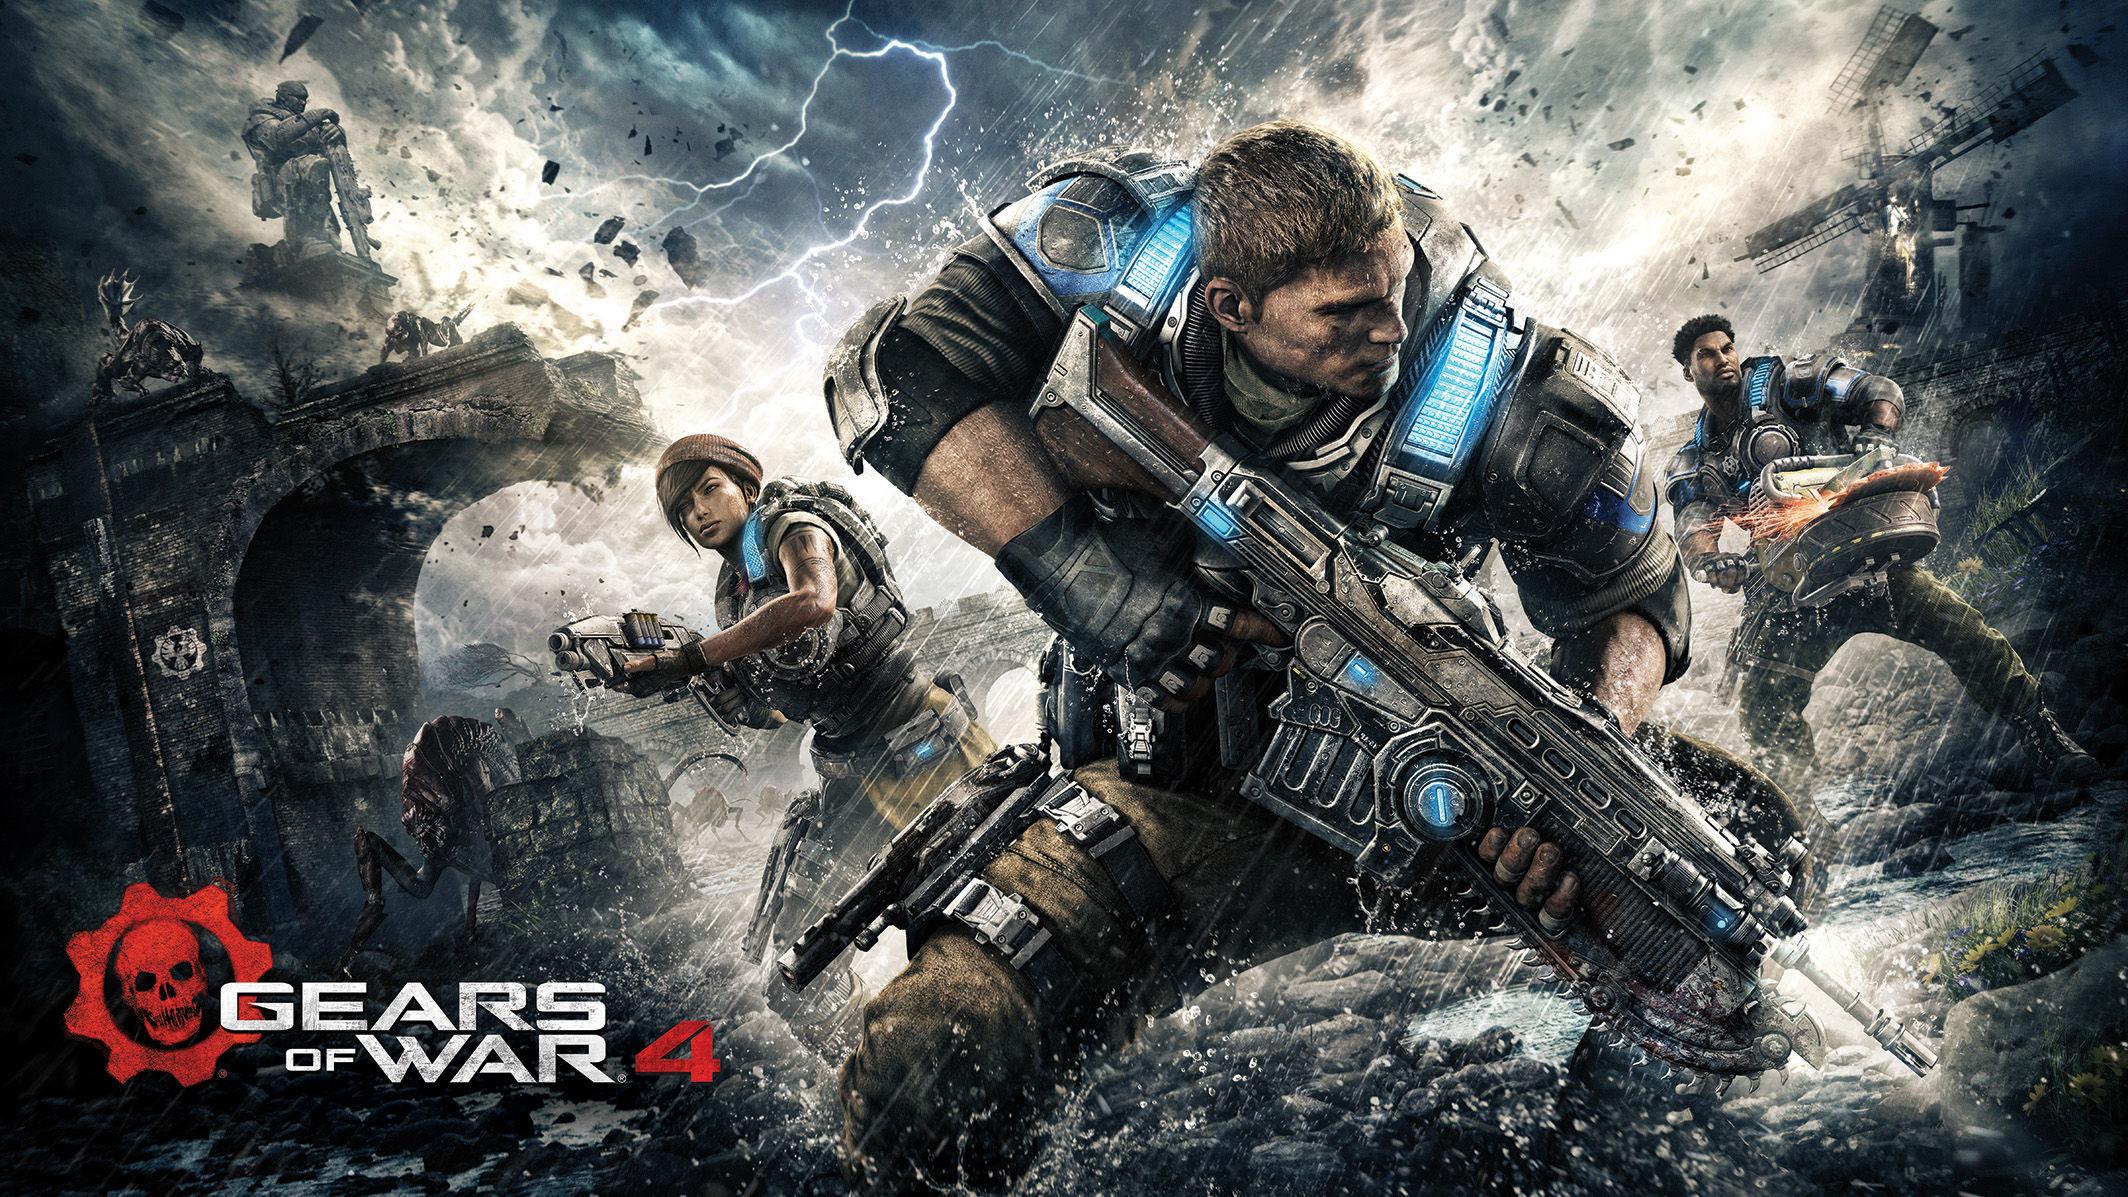 gears-of-war-4